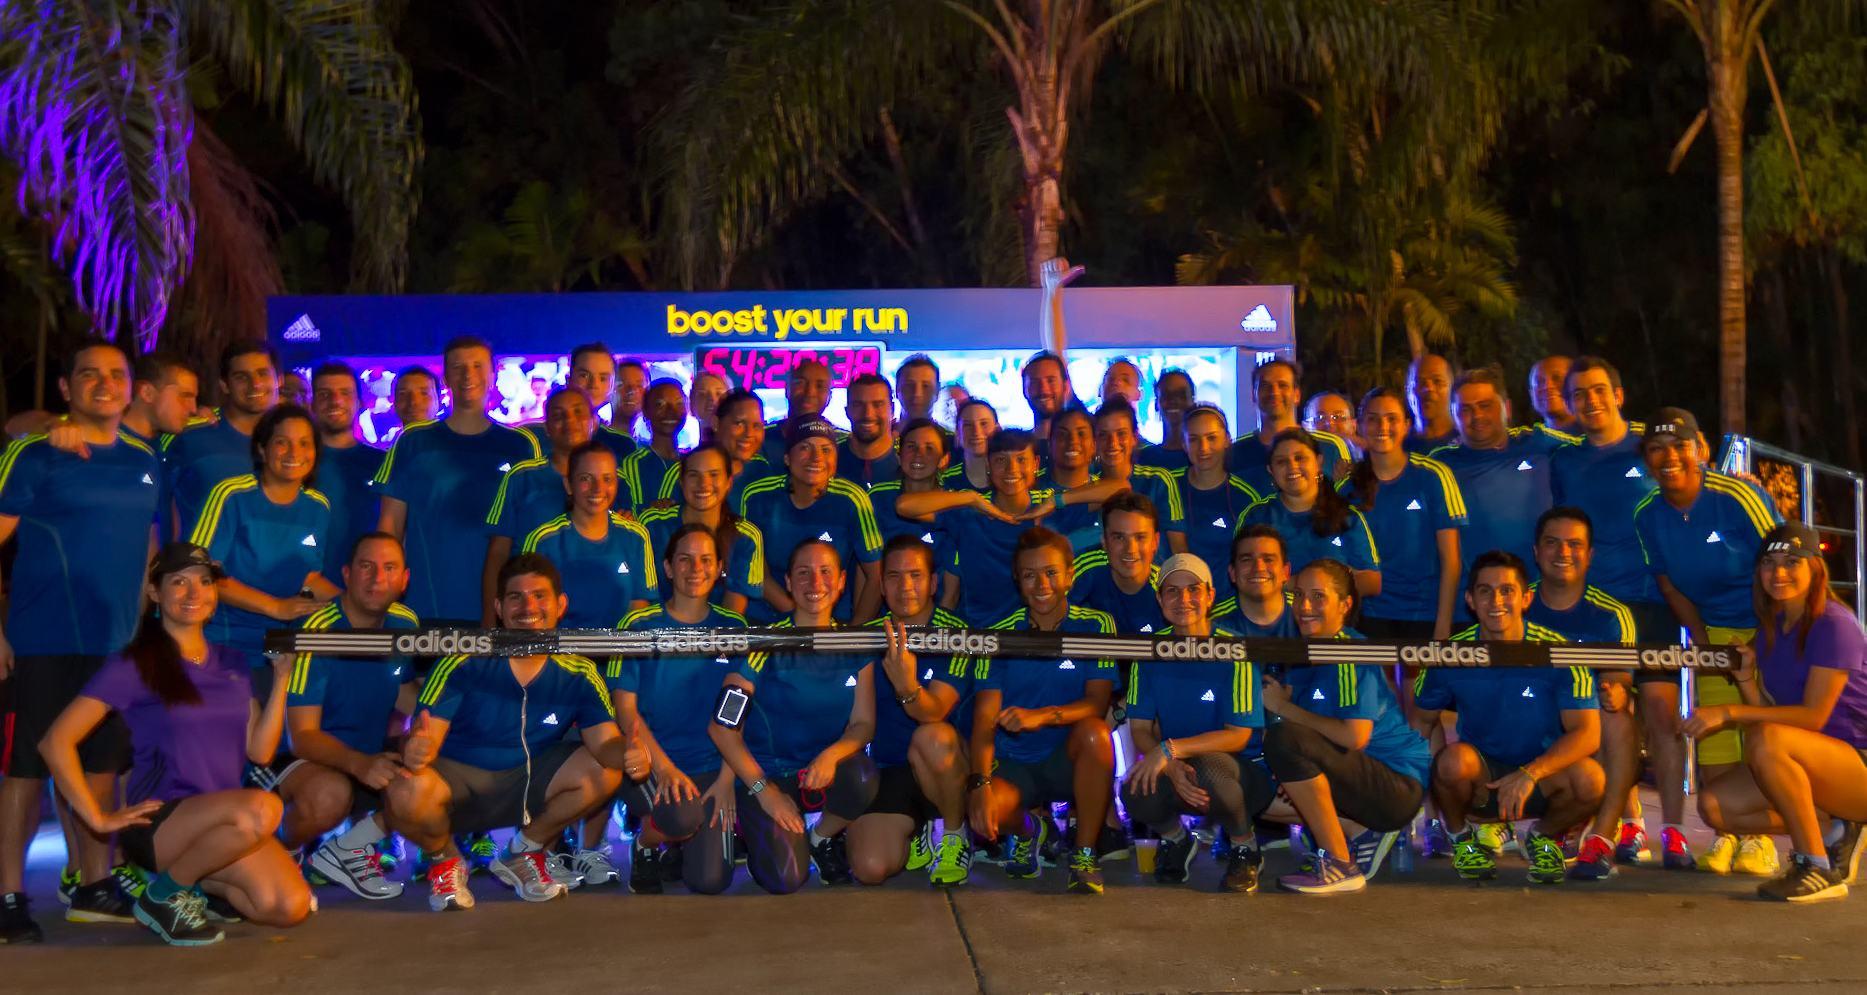 Adidas Running Team Soy Maratonista